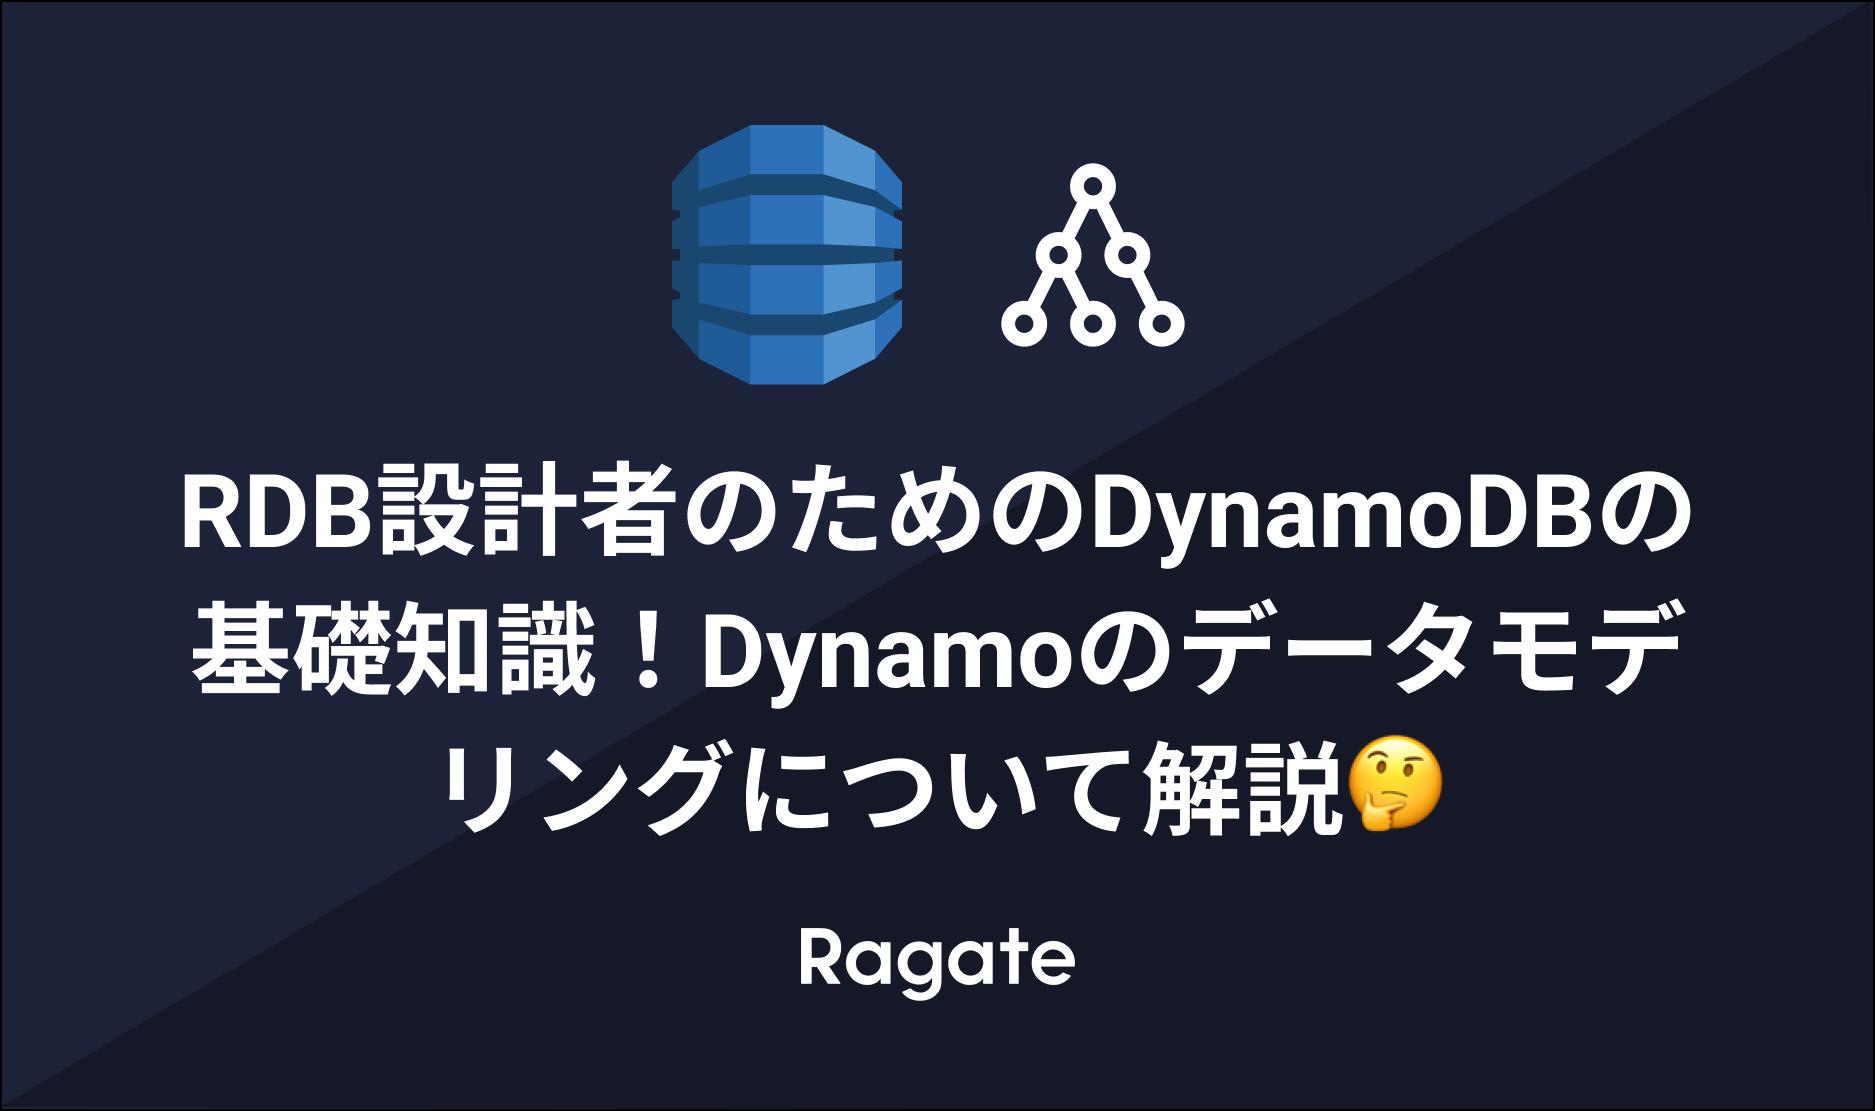 RDB設計者のための DynamoDB の解説!開発経験者が語る DynamoDB 設計入門🤔